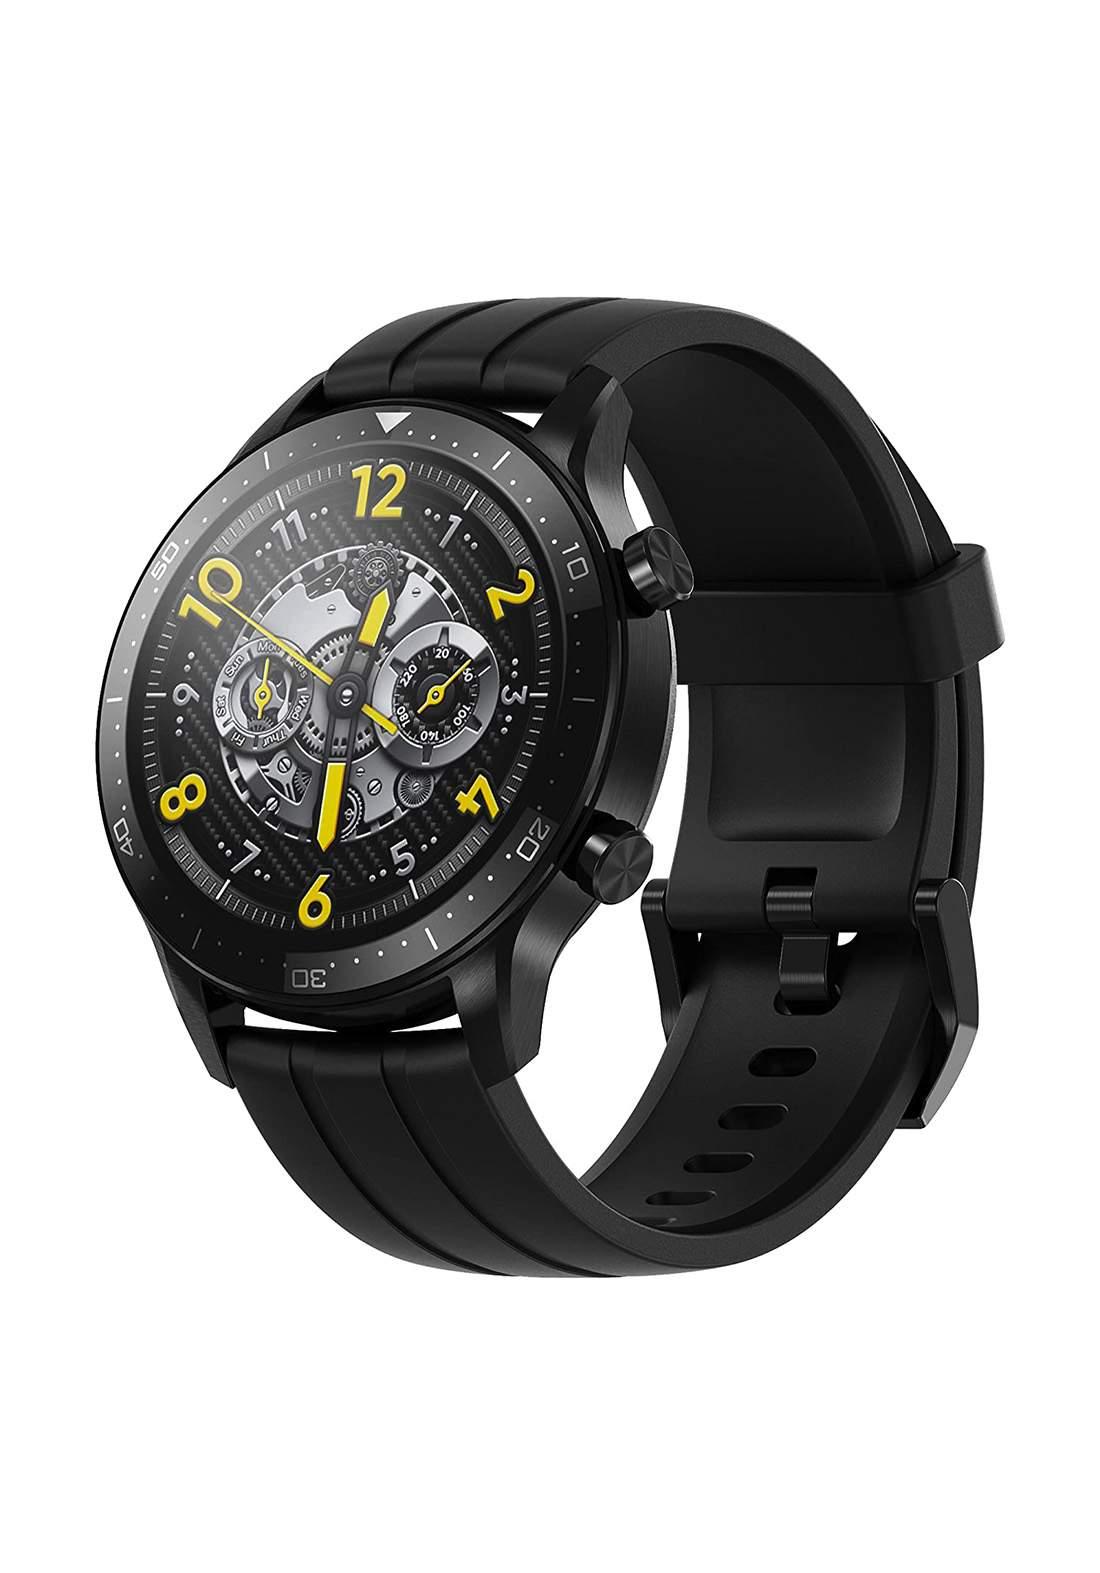 "Realme Watch S Pro 1.39"" Smart Watch - Black ساعة ذكية"